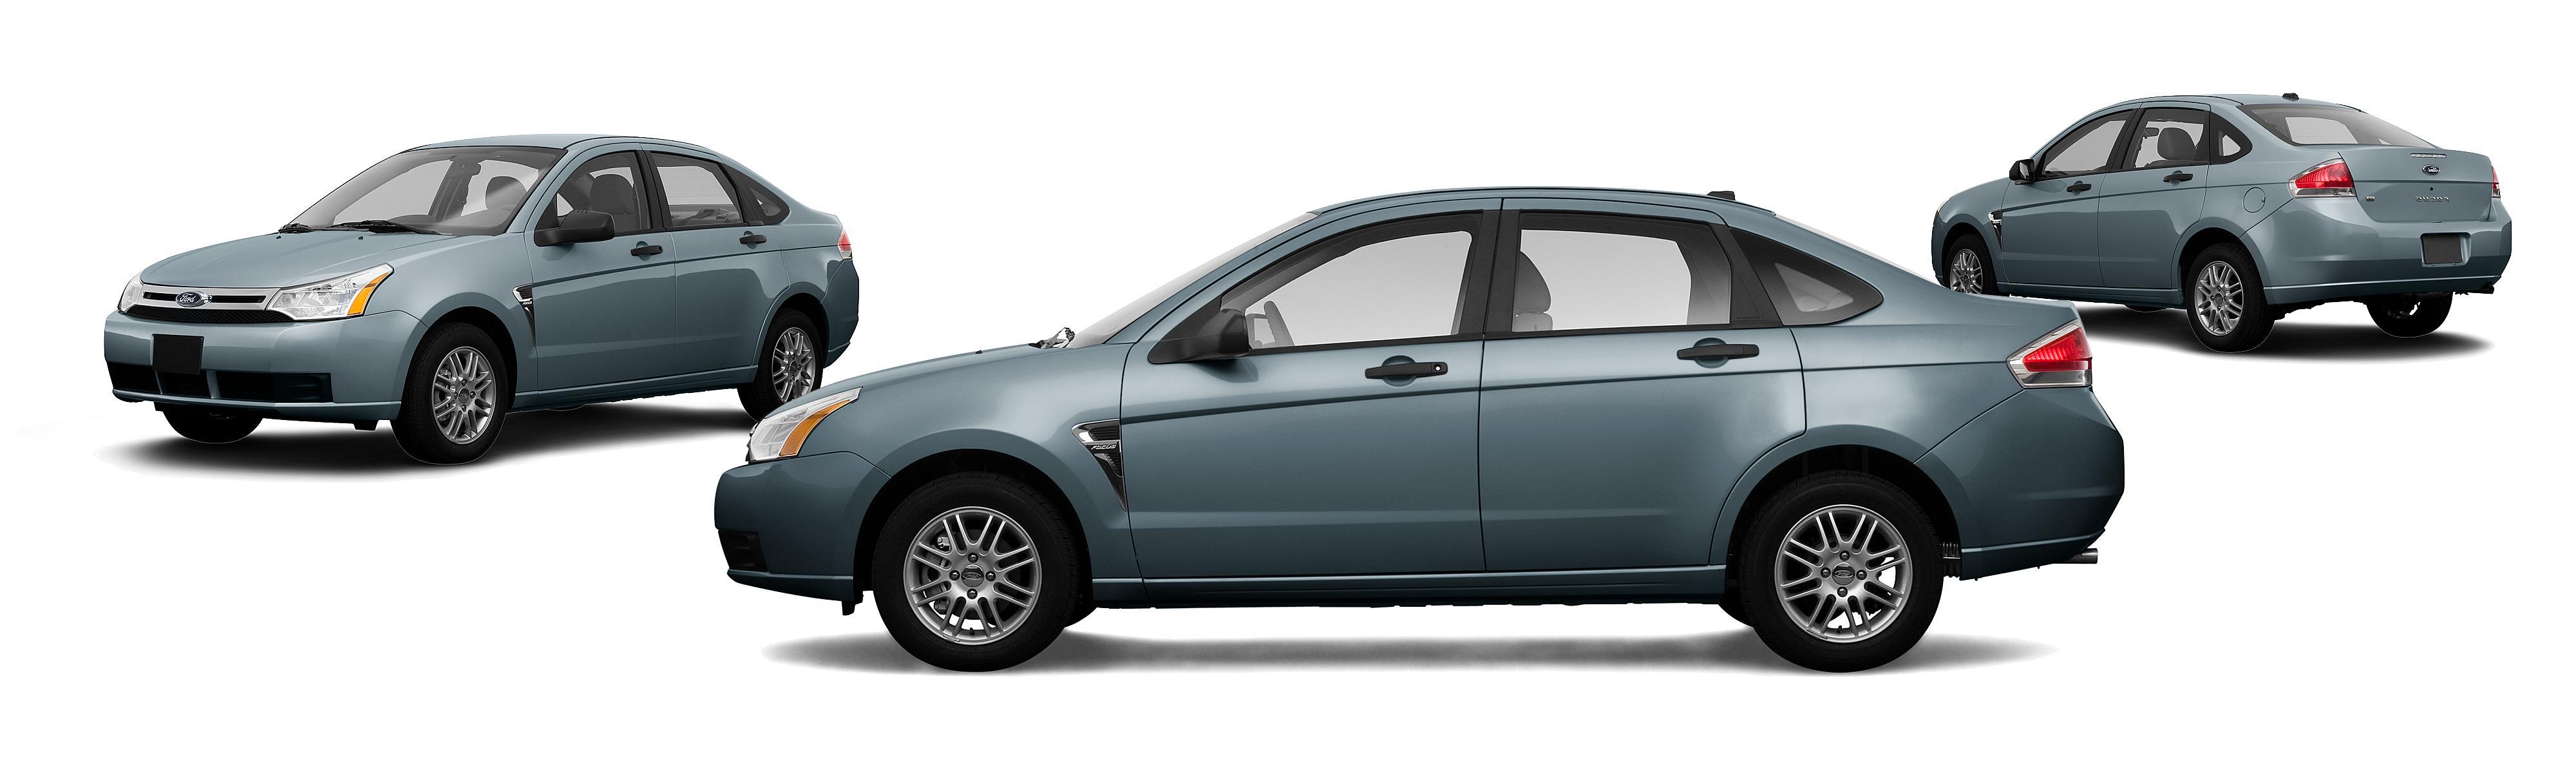 2008 ford focus se 4dr sedan research groovecar